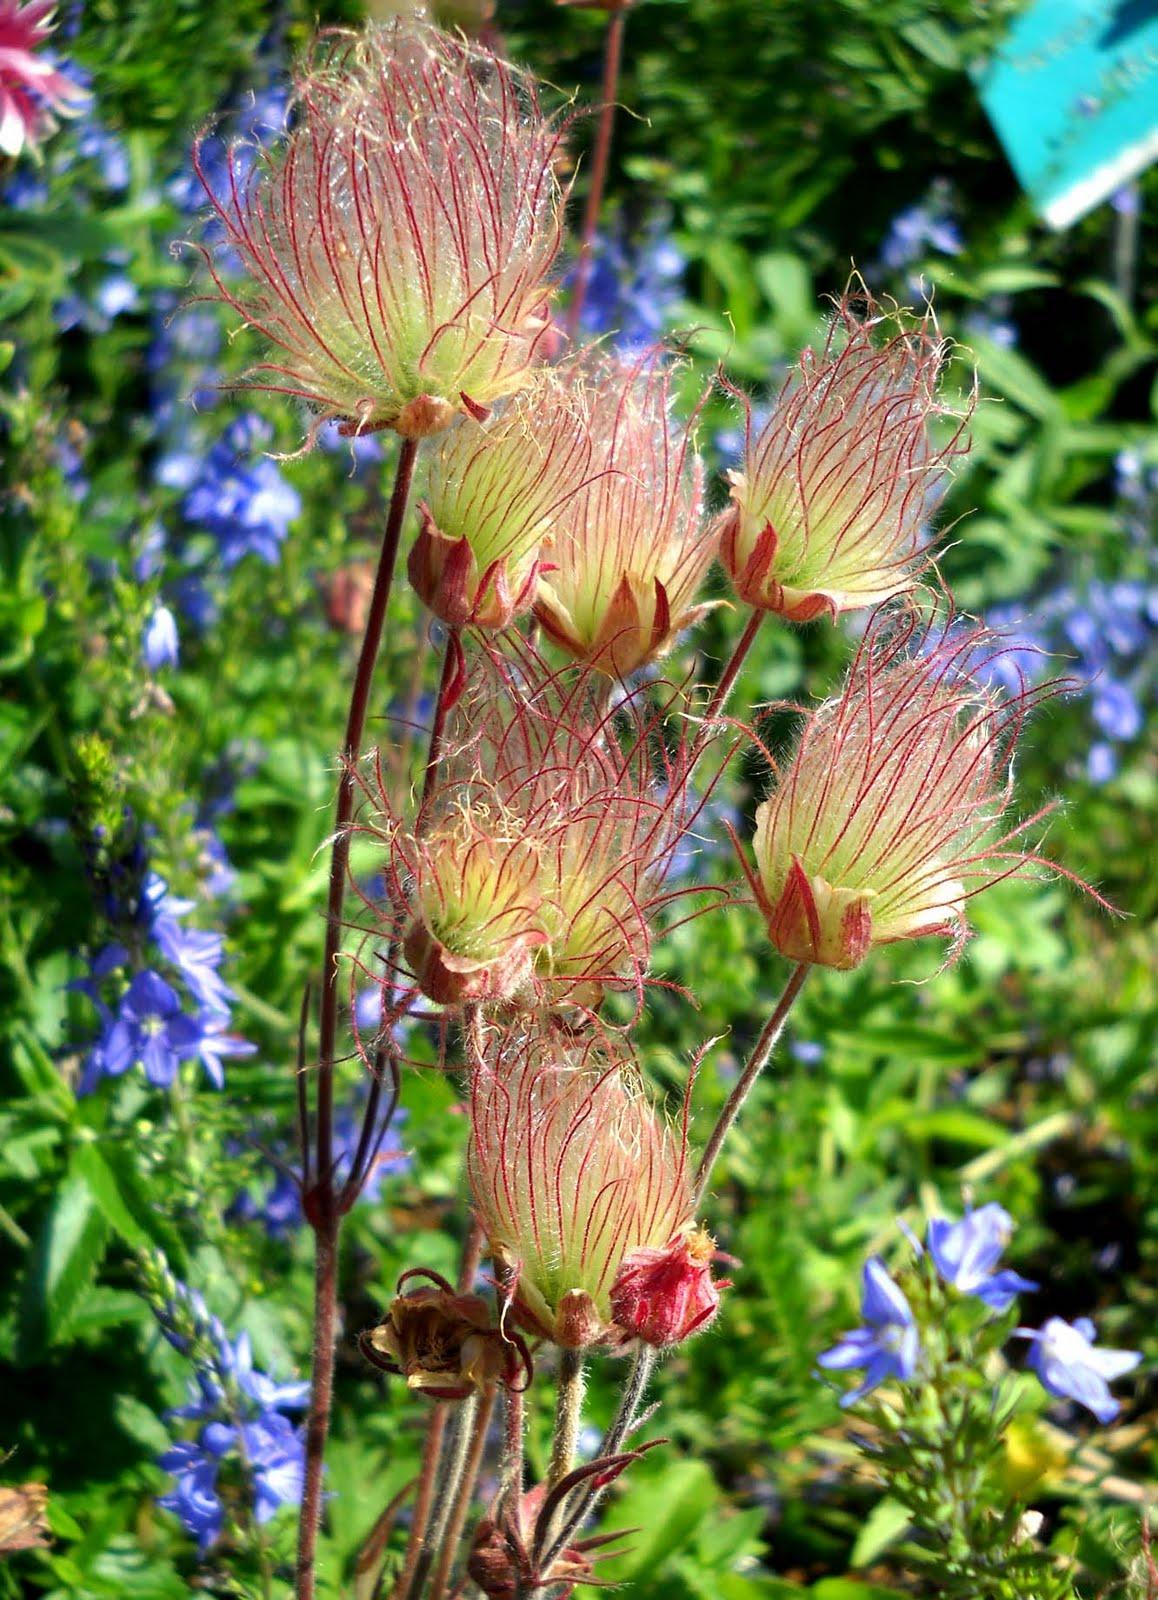 Unusual Flower Blissful Solitary Wanderings